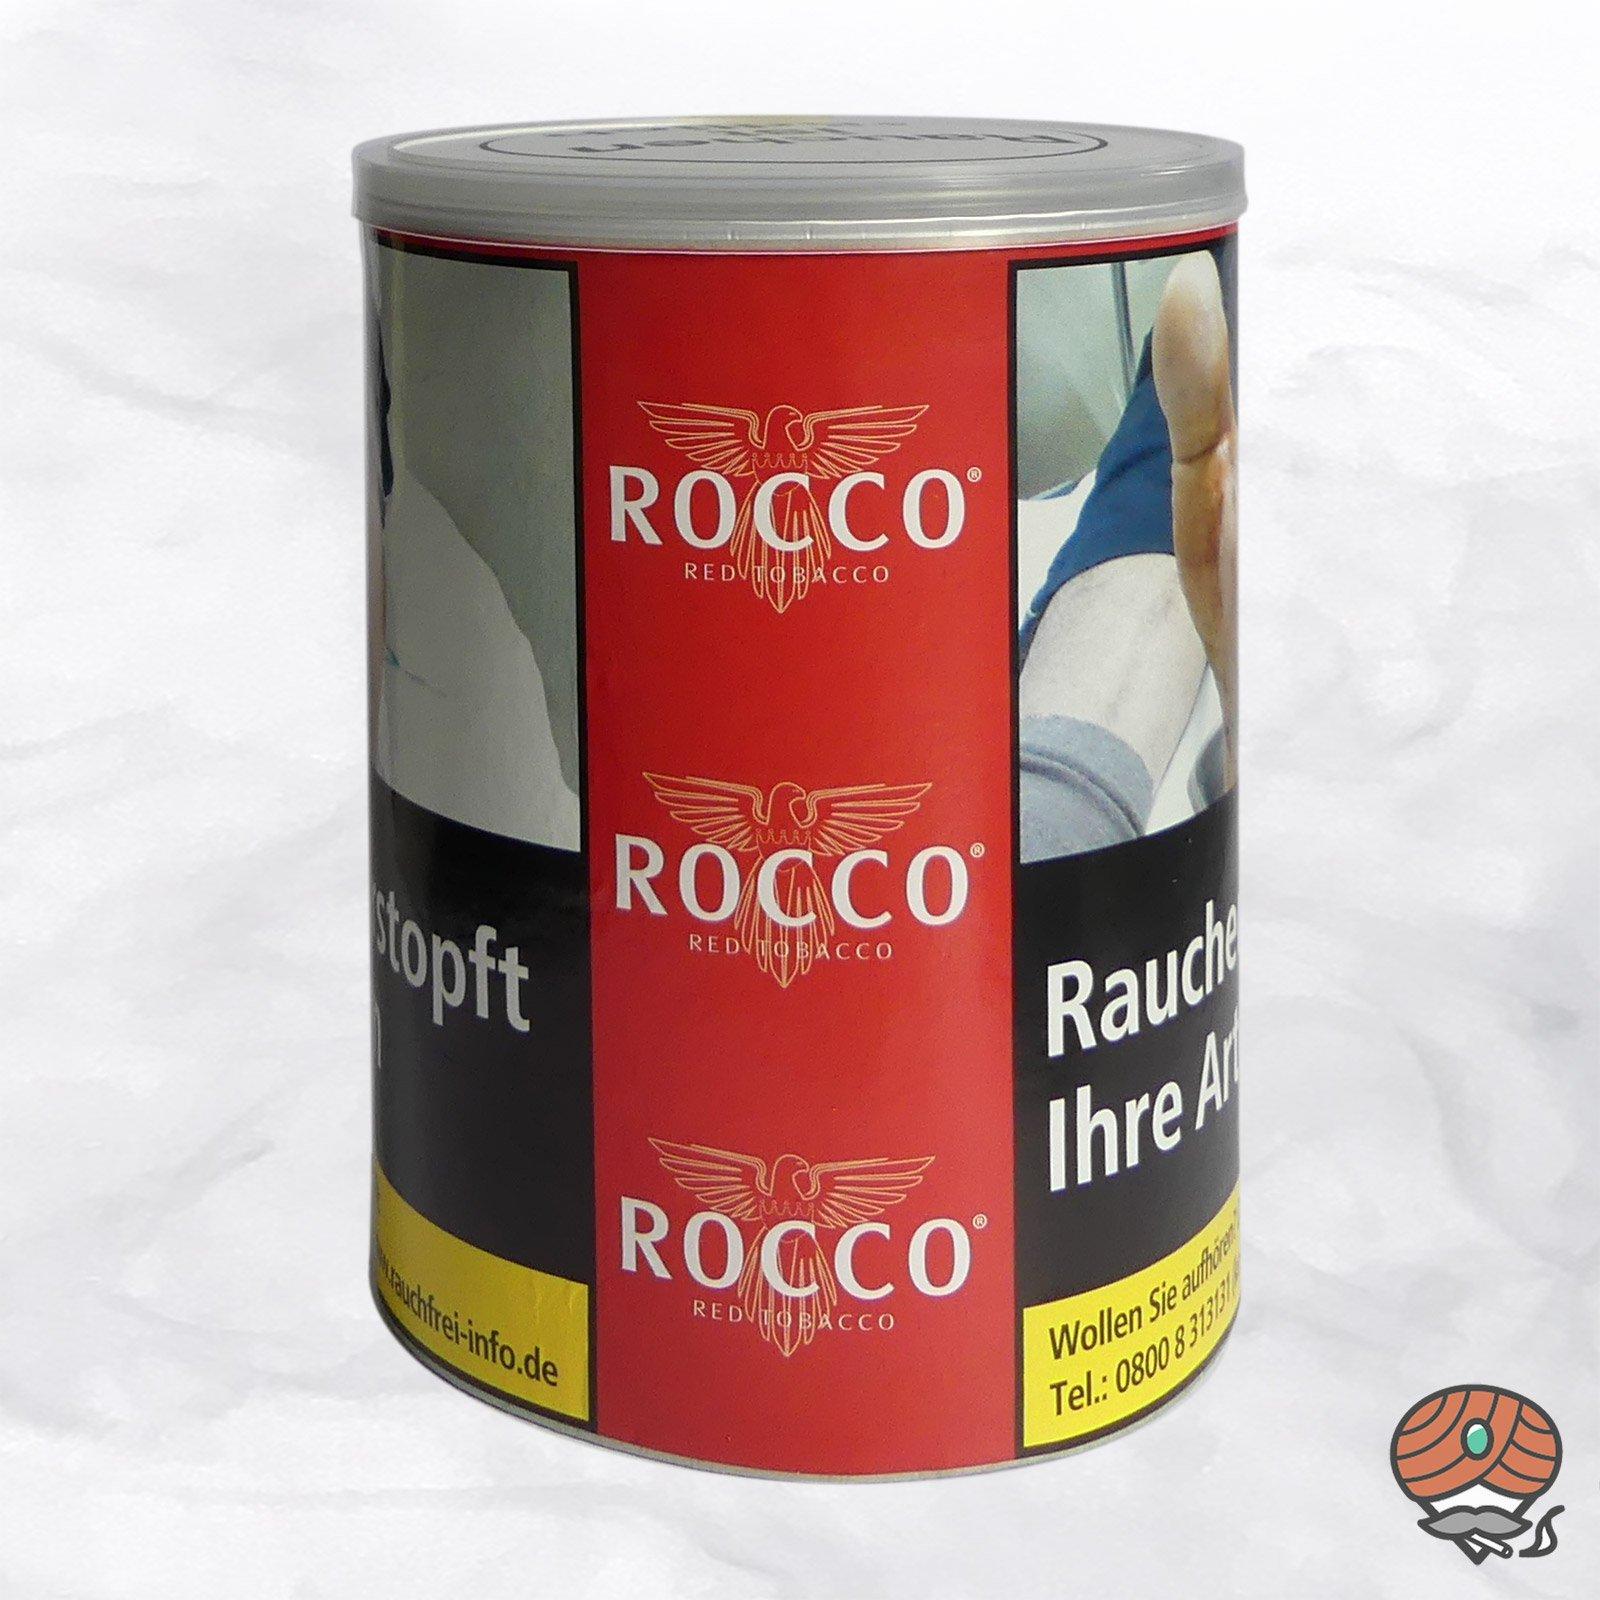 ROCCO Red Tobacco Drehtabak 130 g Dose